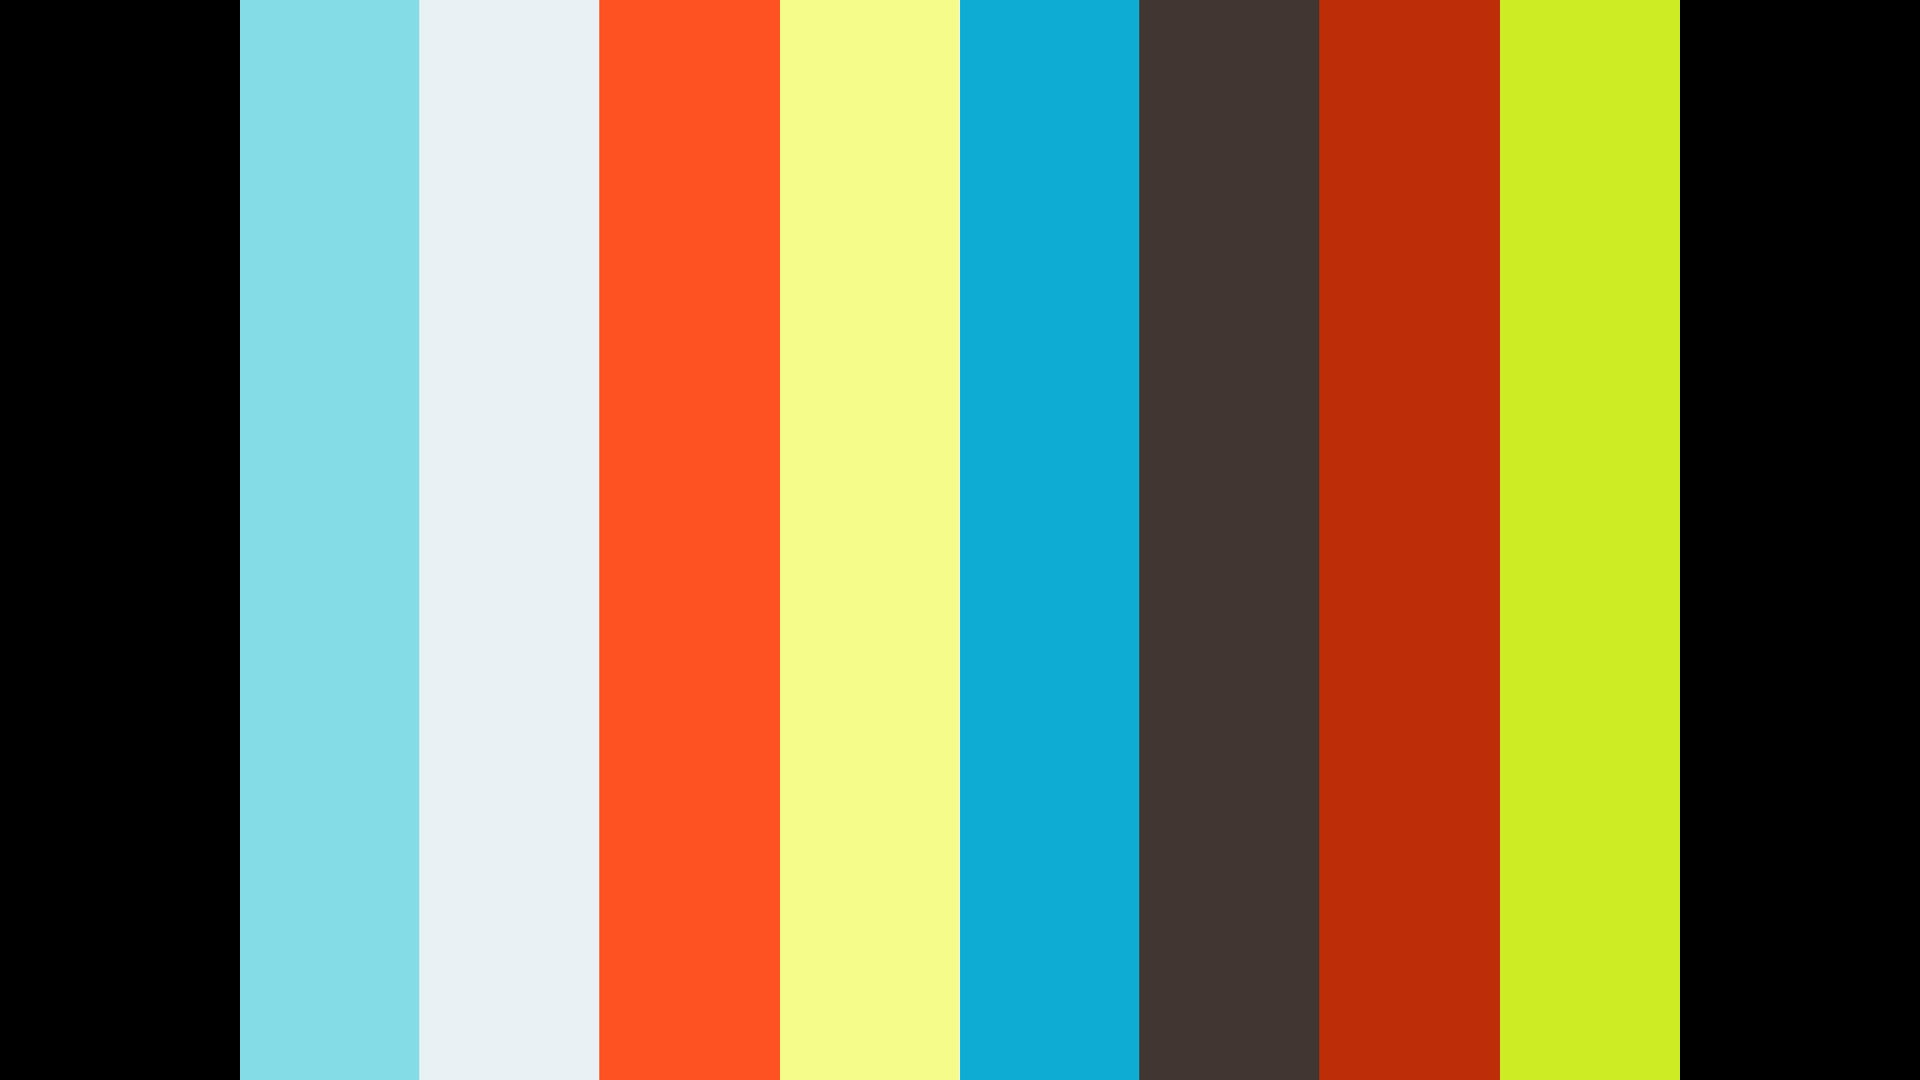 Programme(s) Commun(s) 2020 : Semaine 1 (teaser)